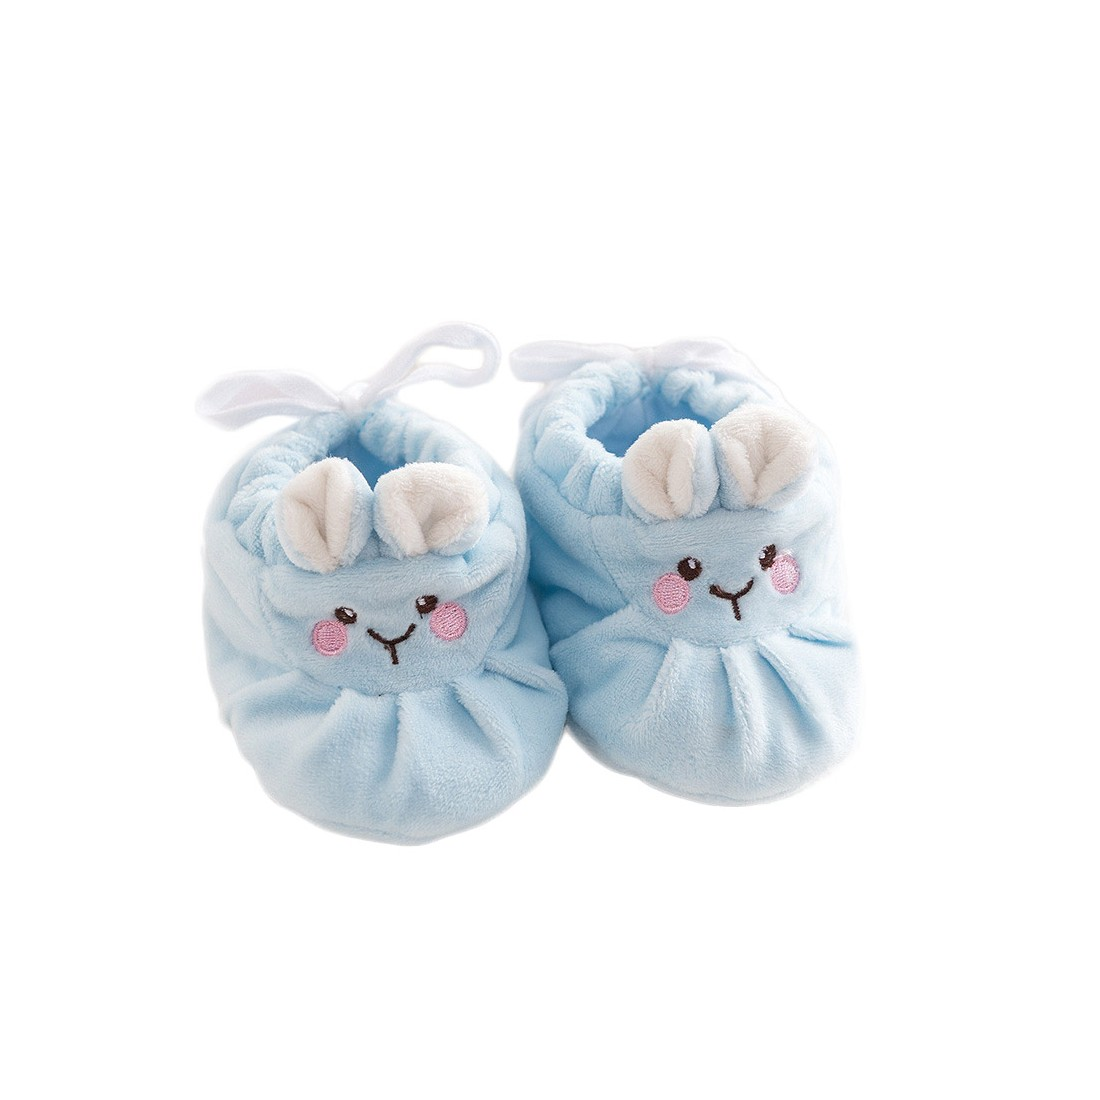 Aspen - Newborn Baby Slippers